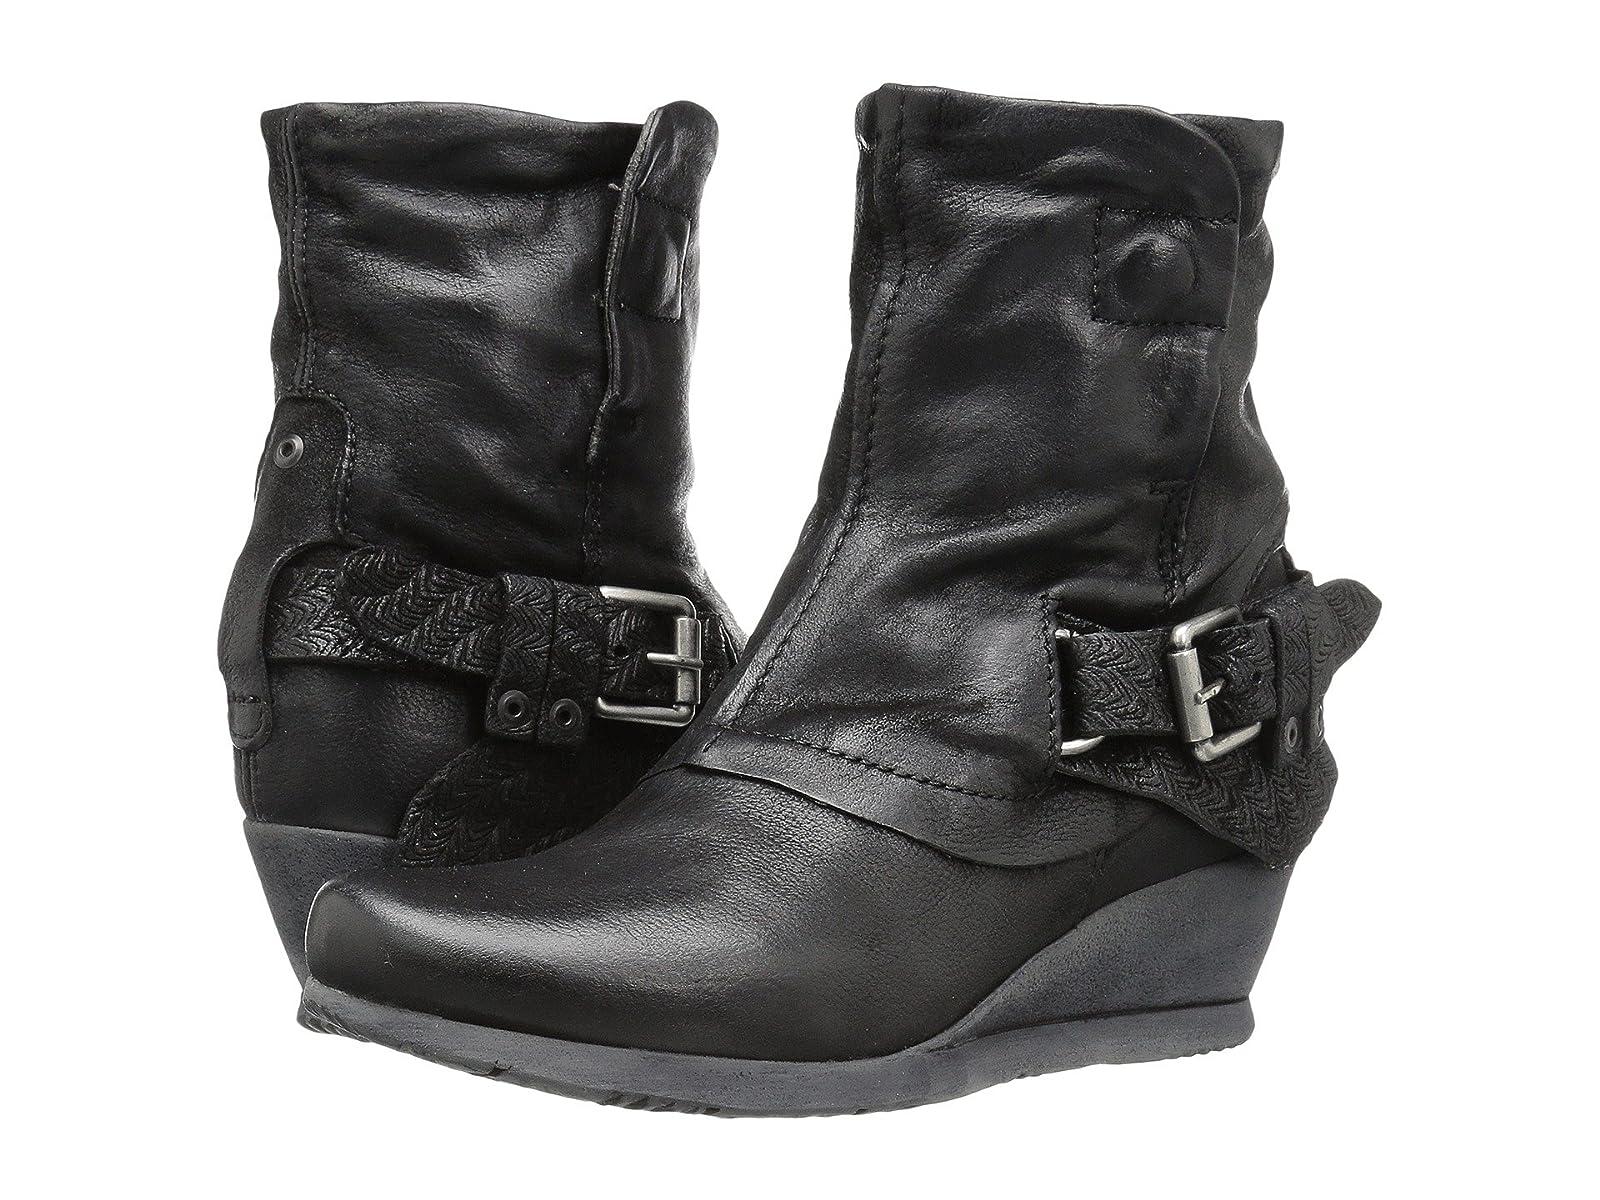 Miz Mooz MargieCheap and distinctive eye-catching shoes